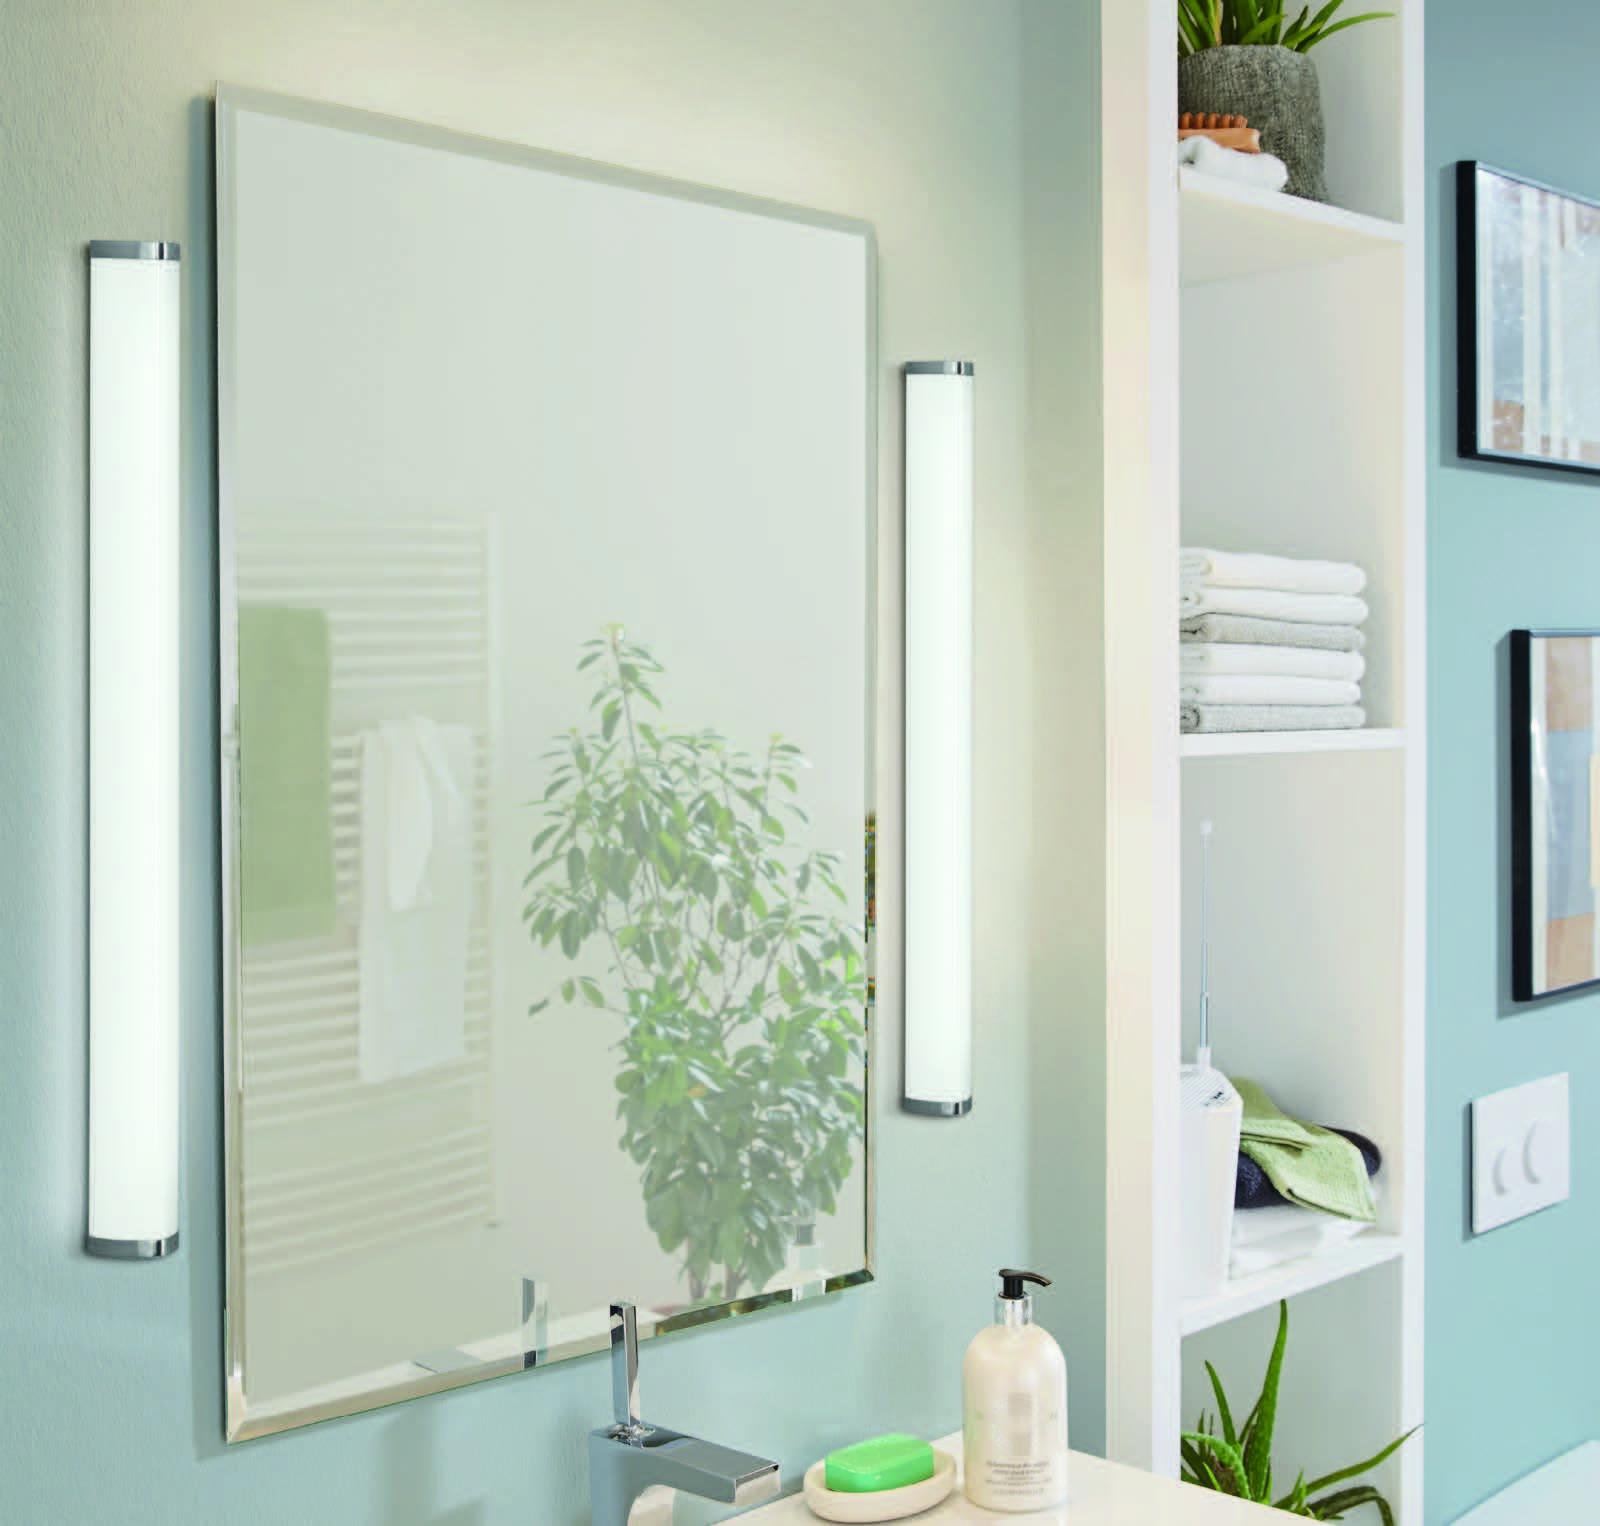 EGLO 94716 CALNOVA svítidlo nad zrcadlodo koupelny